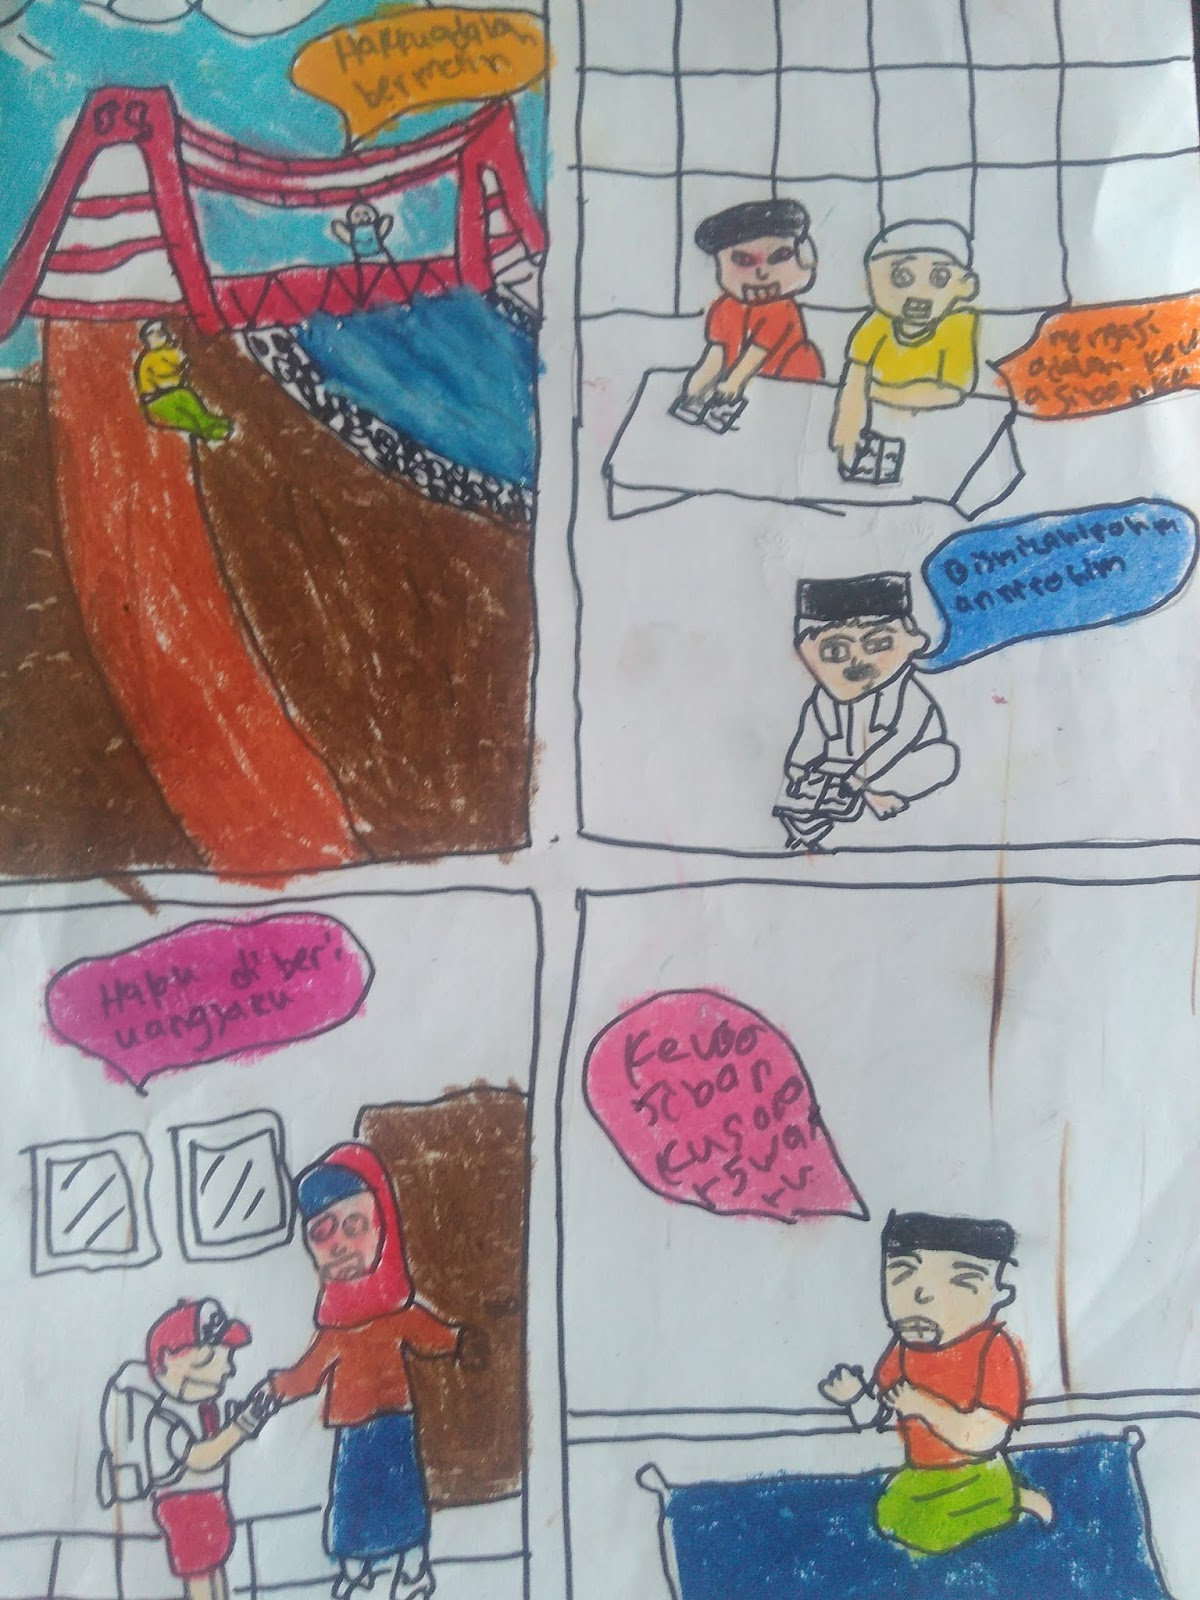 Gambar Komik Hak Dan Kewajibanmu Sebagai Seorang Siswa Maupun Sebagai Seorang Anak Gurune Net